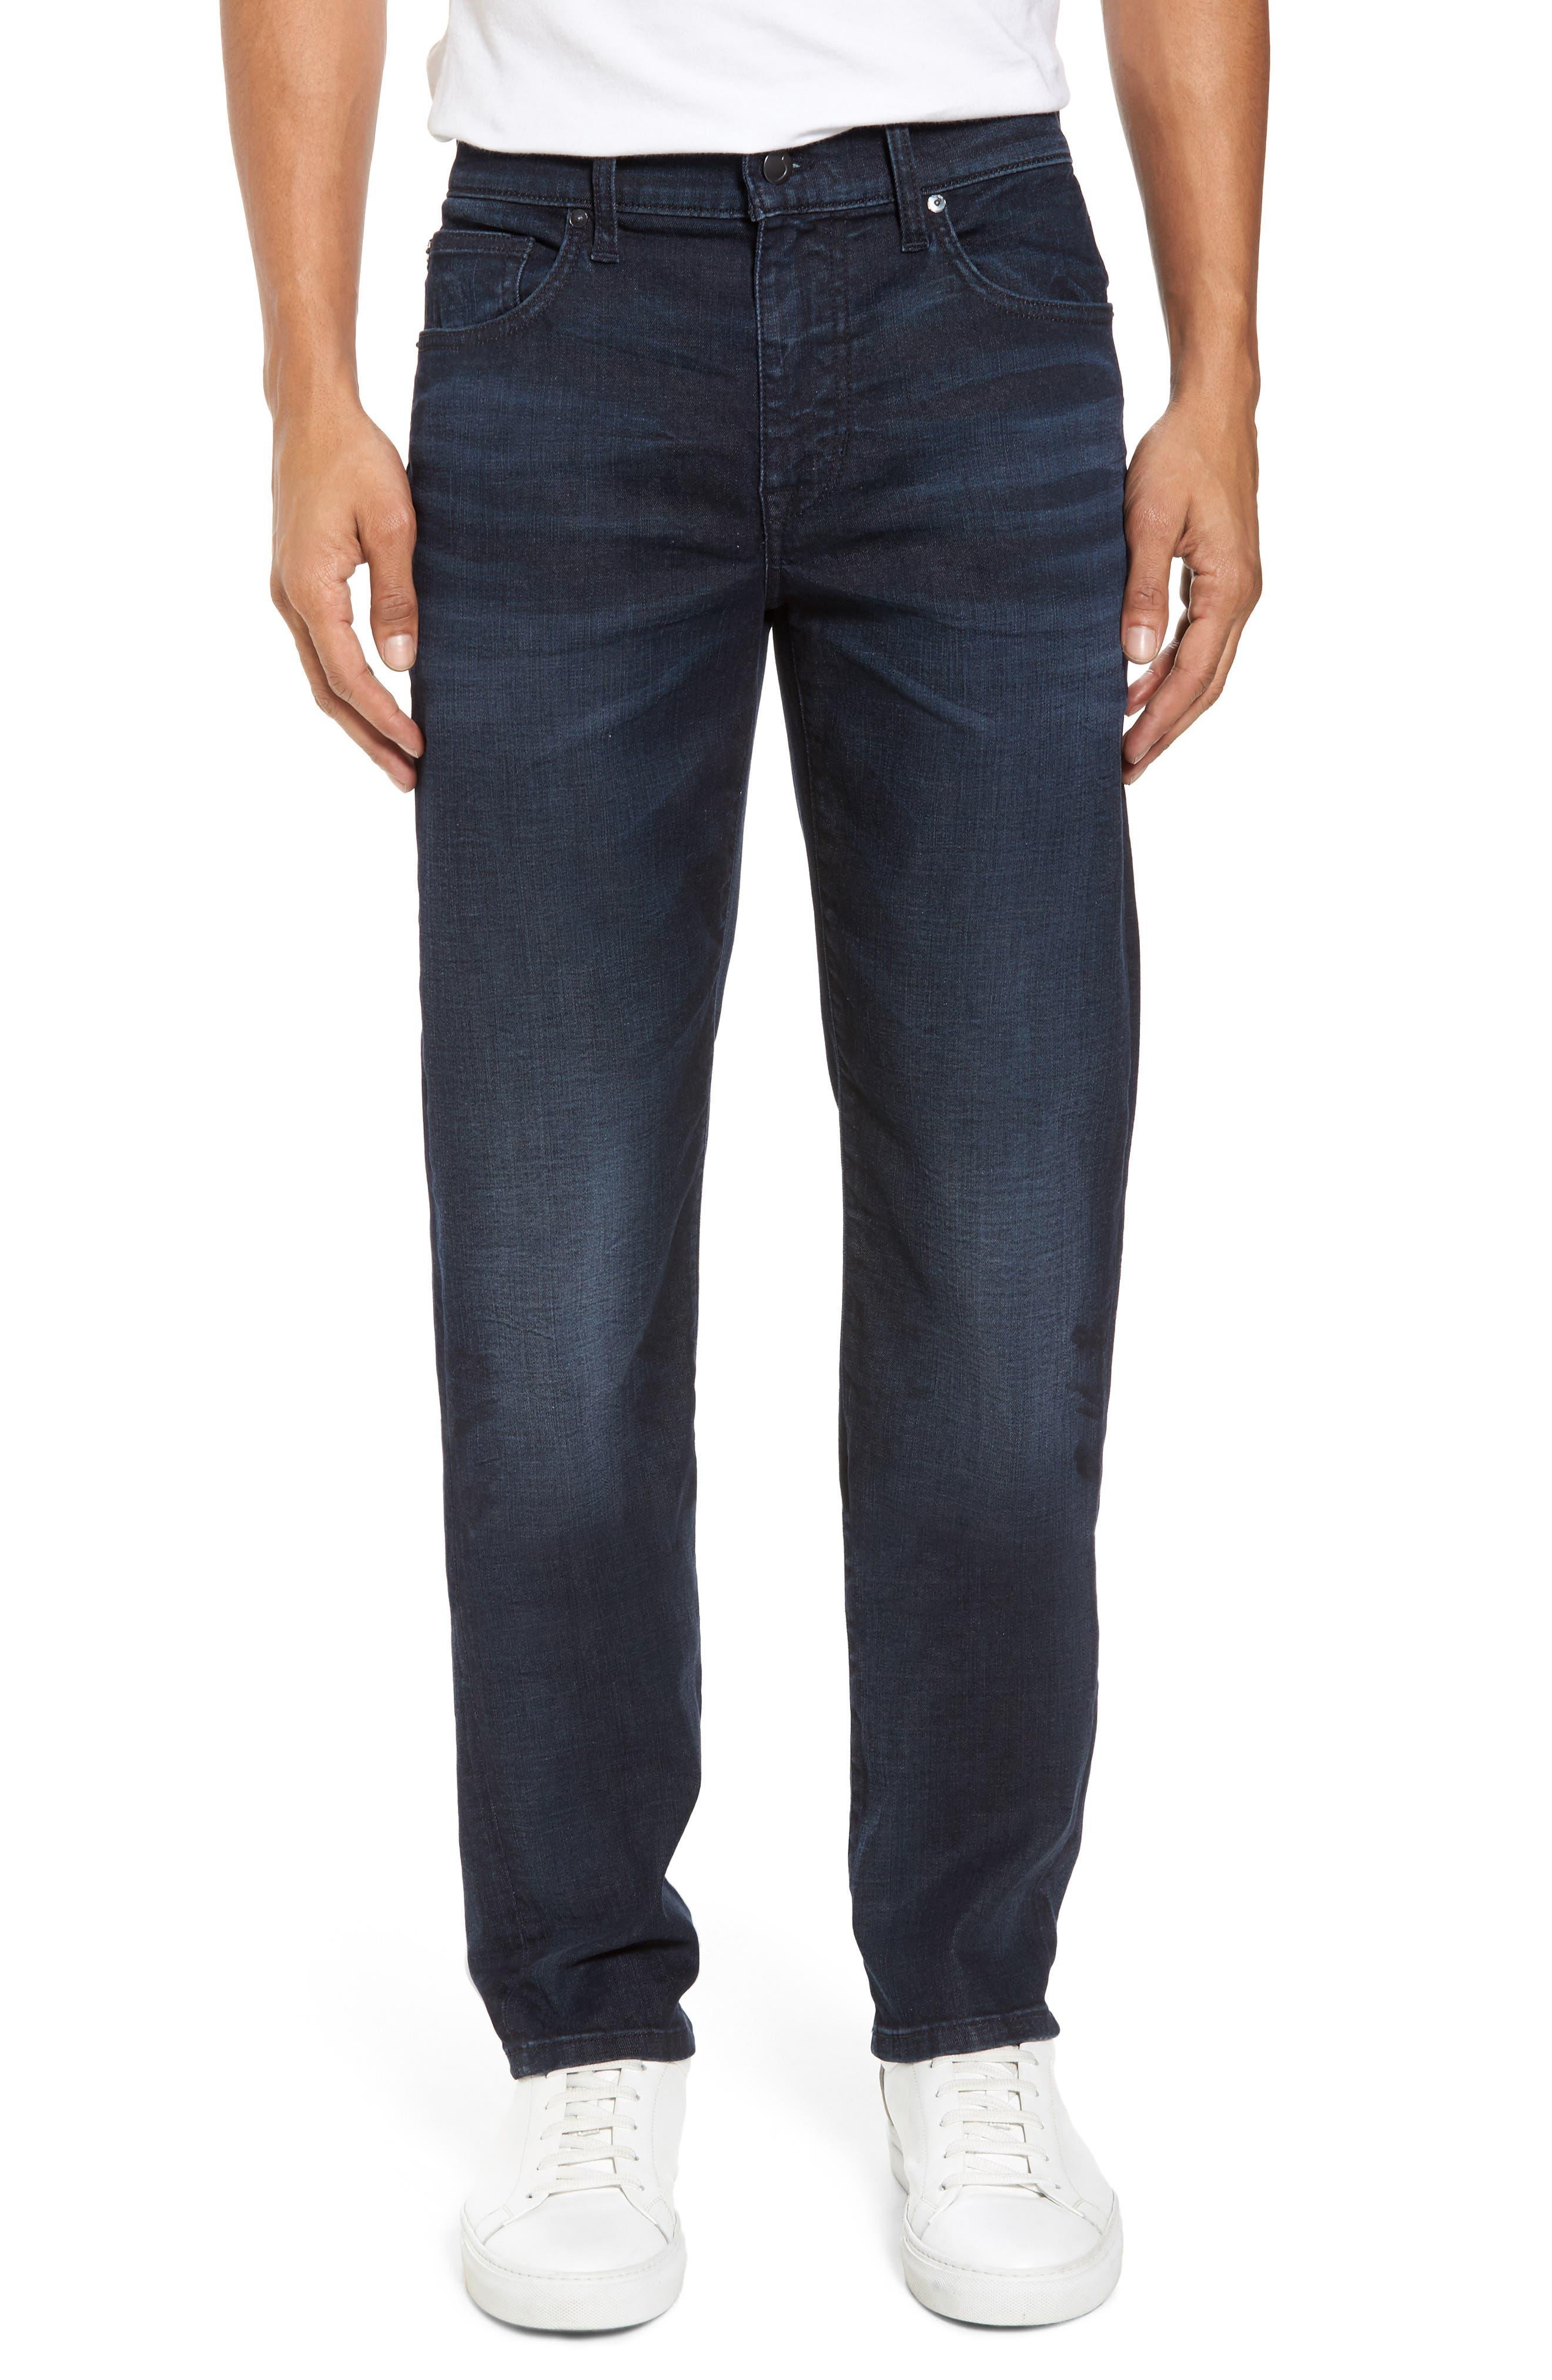 Brixton Slim Straight Leg Jeans,                         Main,                         color, Larsen